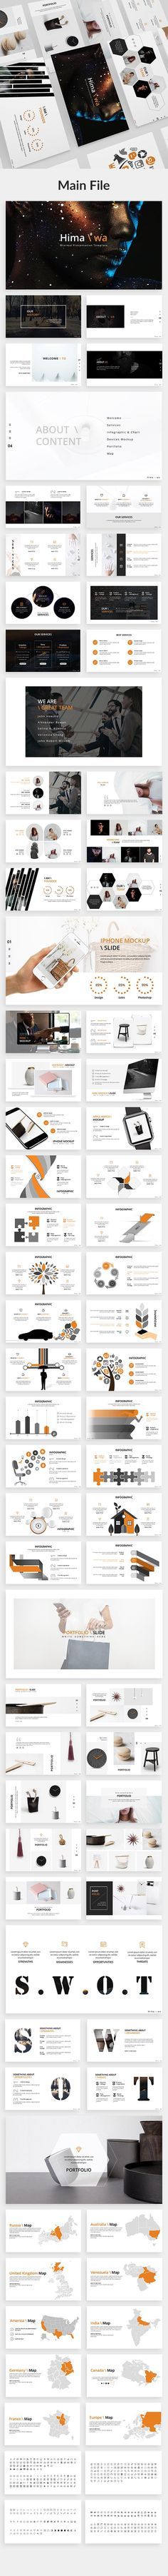 Himawa Creative Powerpoint Template by Zin Studio on @creativemarket